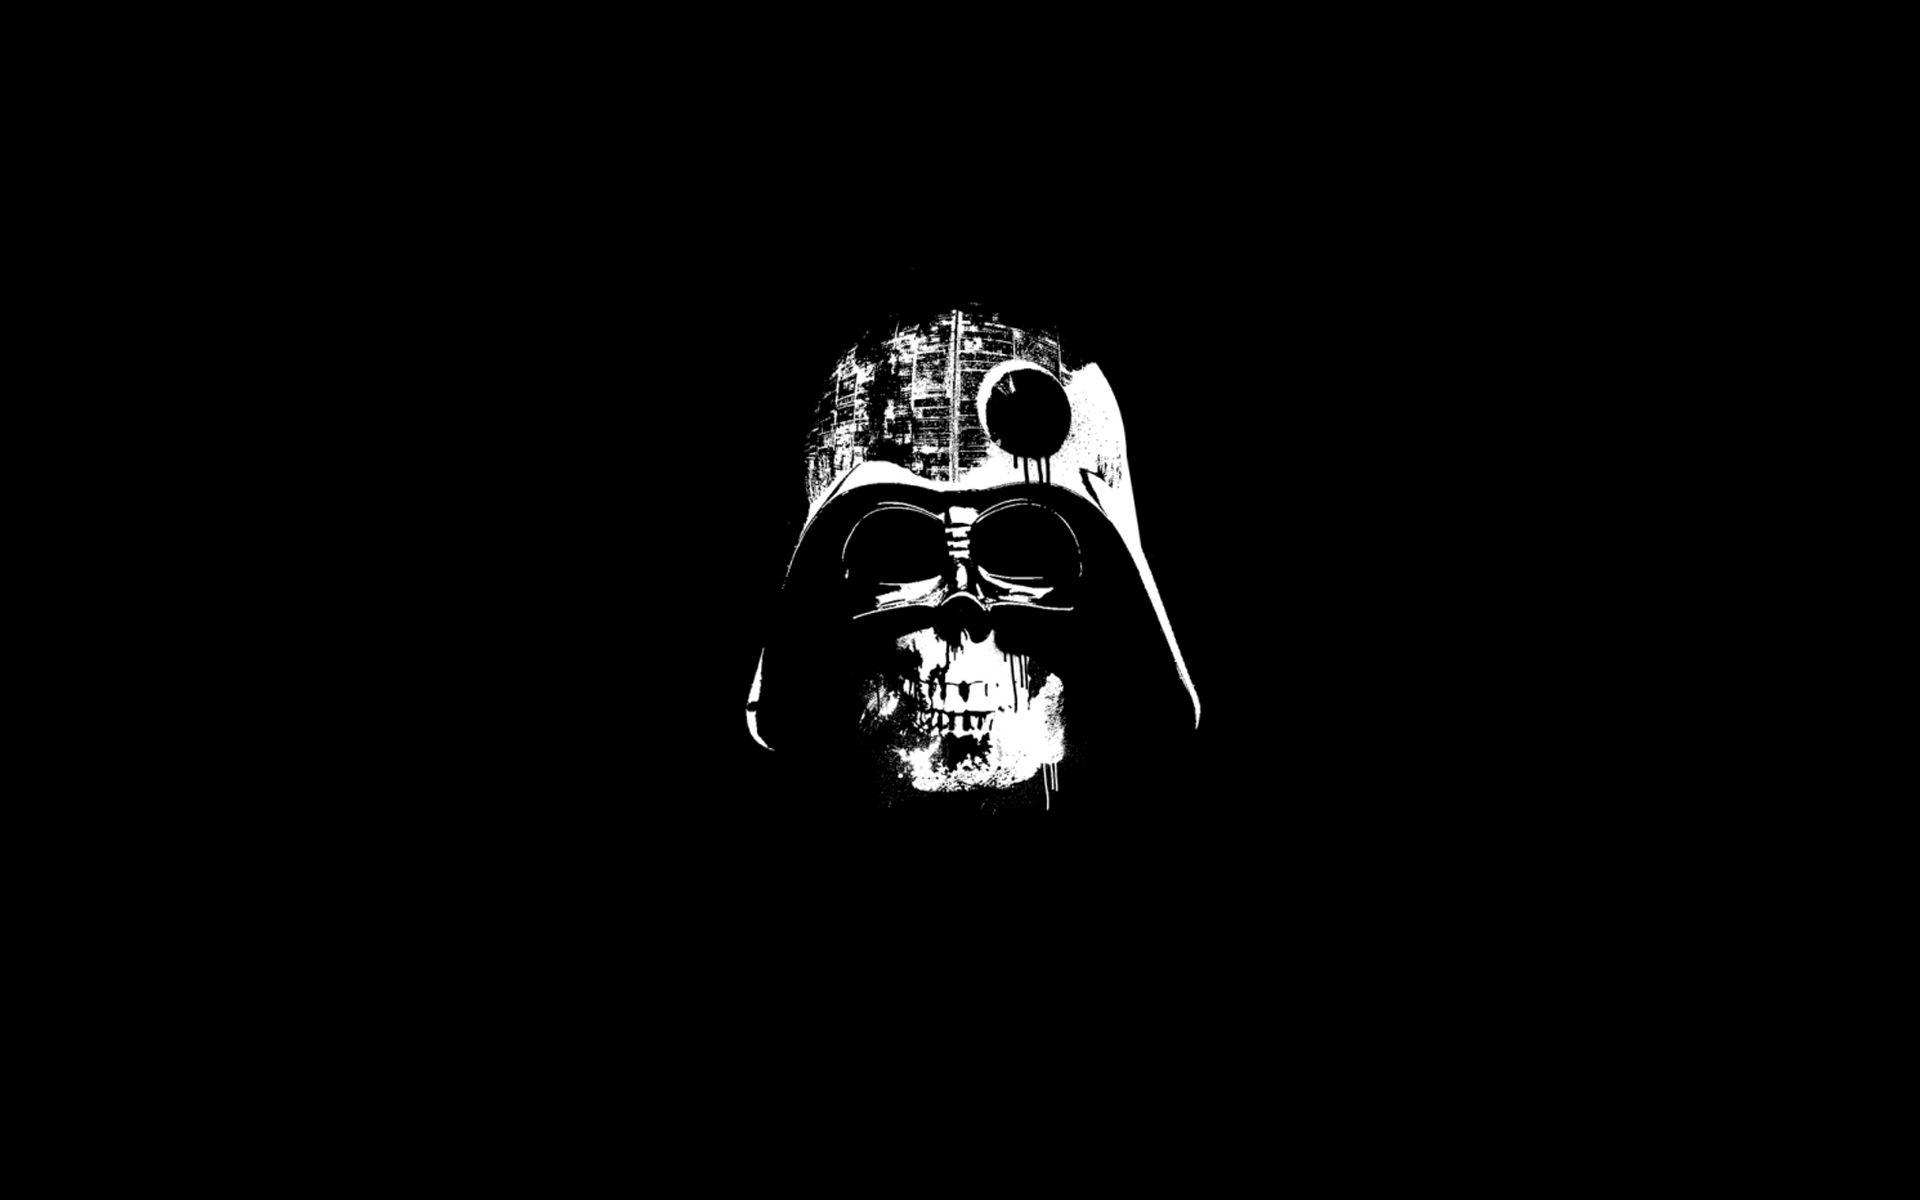 Wallpaper iphone twitter - Star Wars Twitter Backgrounds